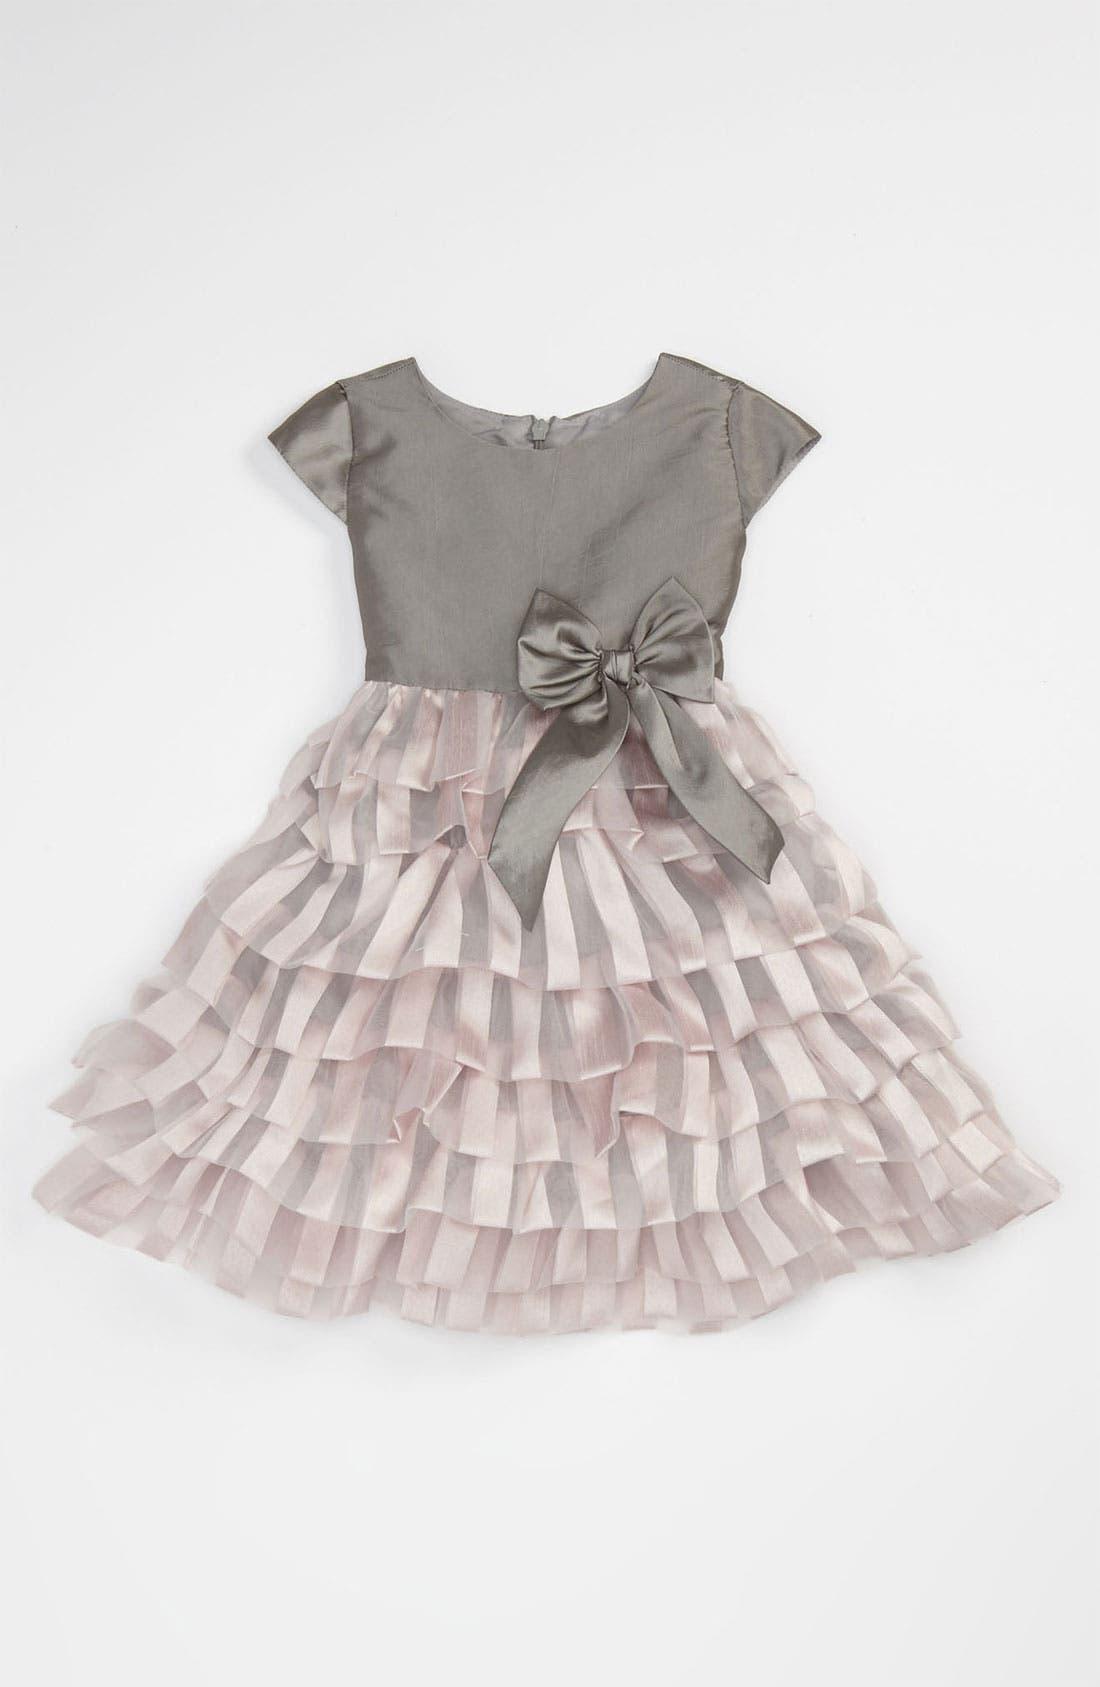 Alternate Image 1 Selected - Isobella & Chloe 'Prima Ballerina' Dress (Toddler)